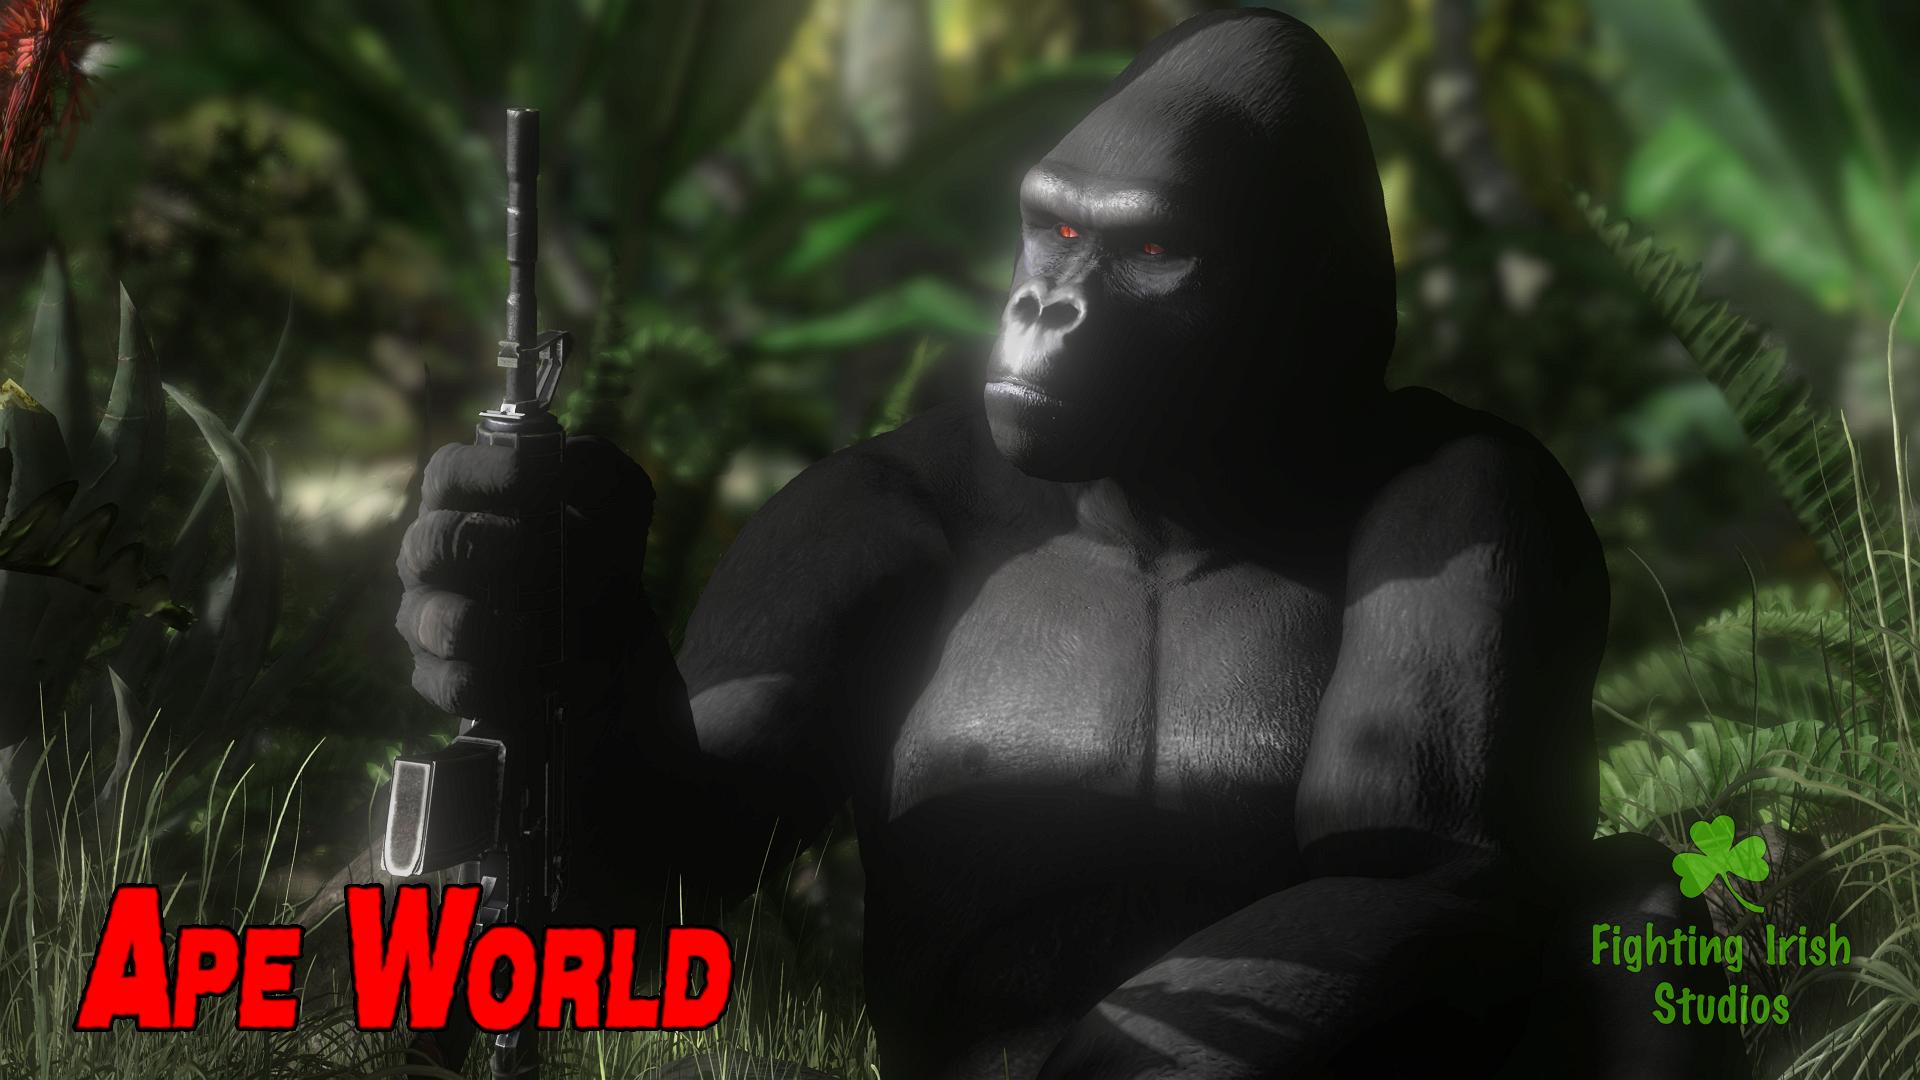 Ape World by Fighting Irish Studios